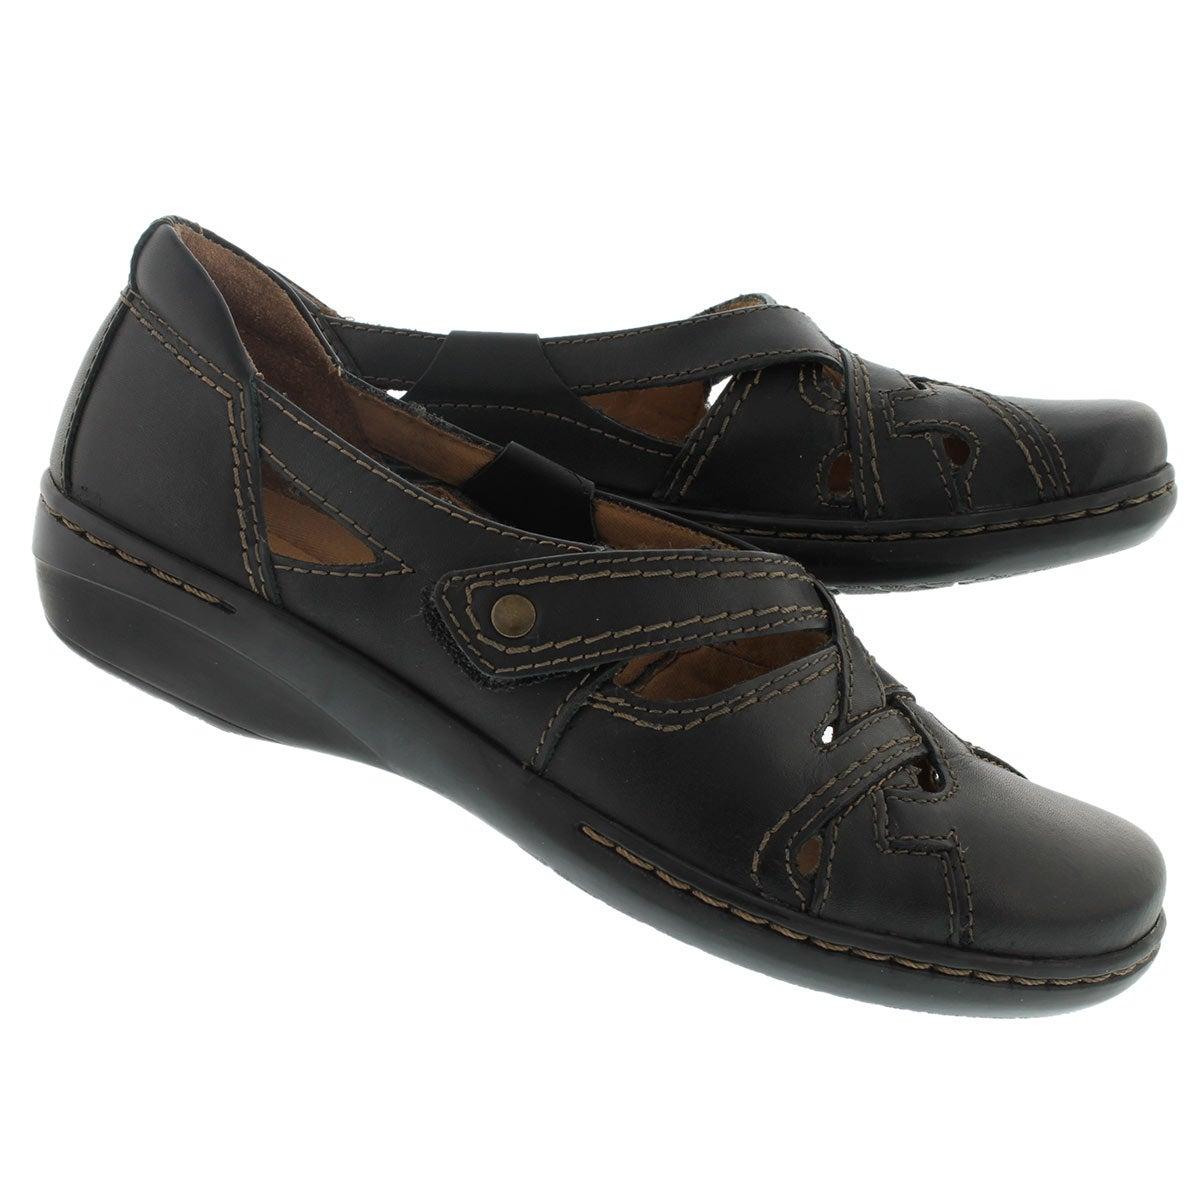 Lds Evianna Peal black slip on shoe